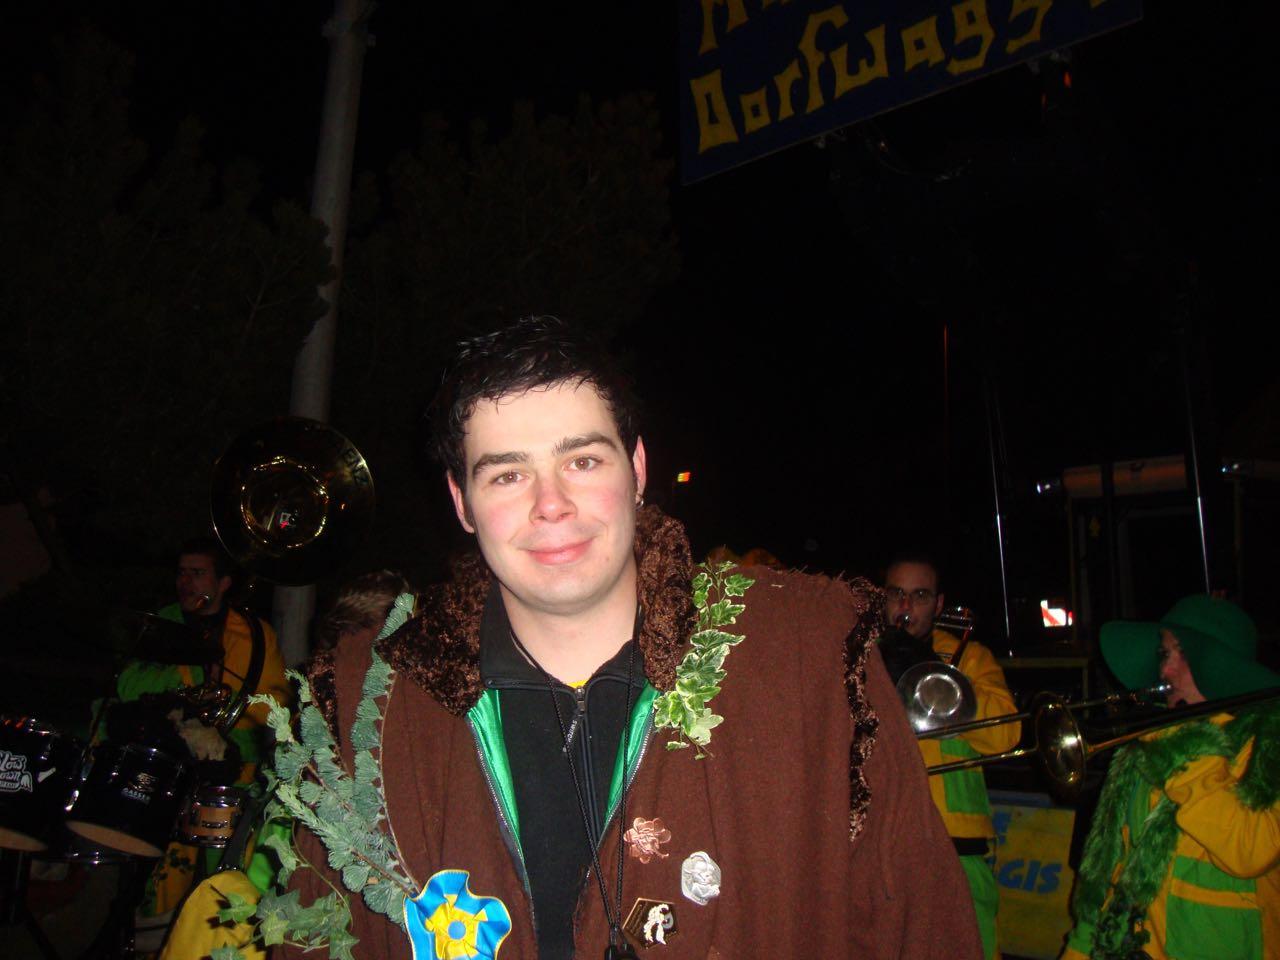 Patrick Kupferschmid (10)